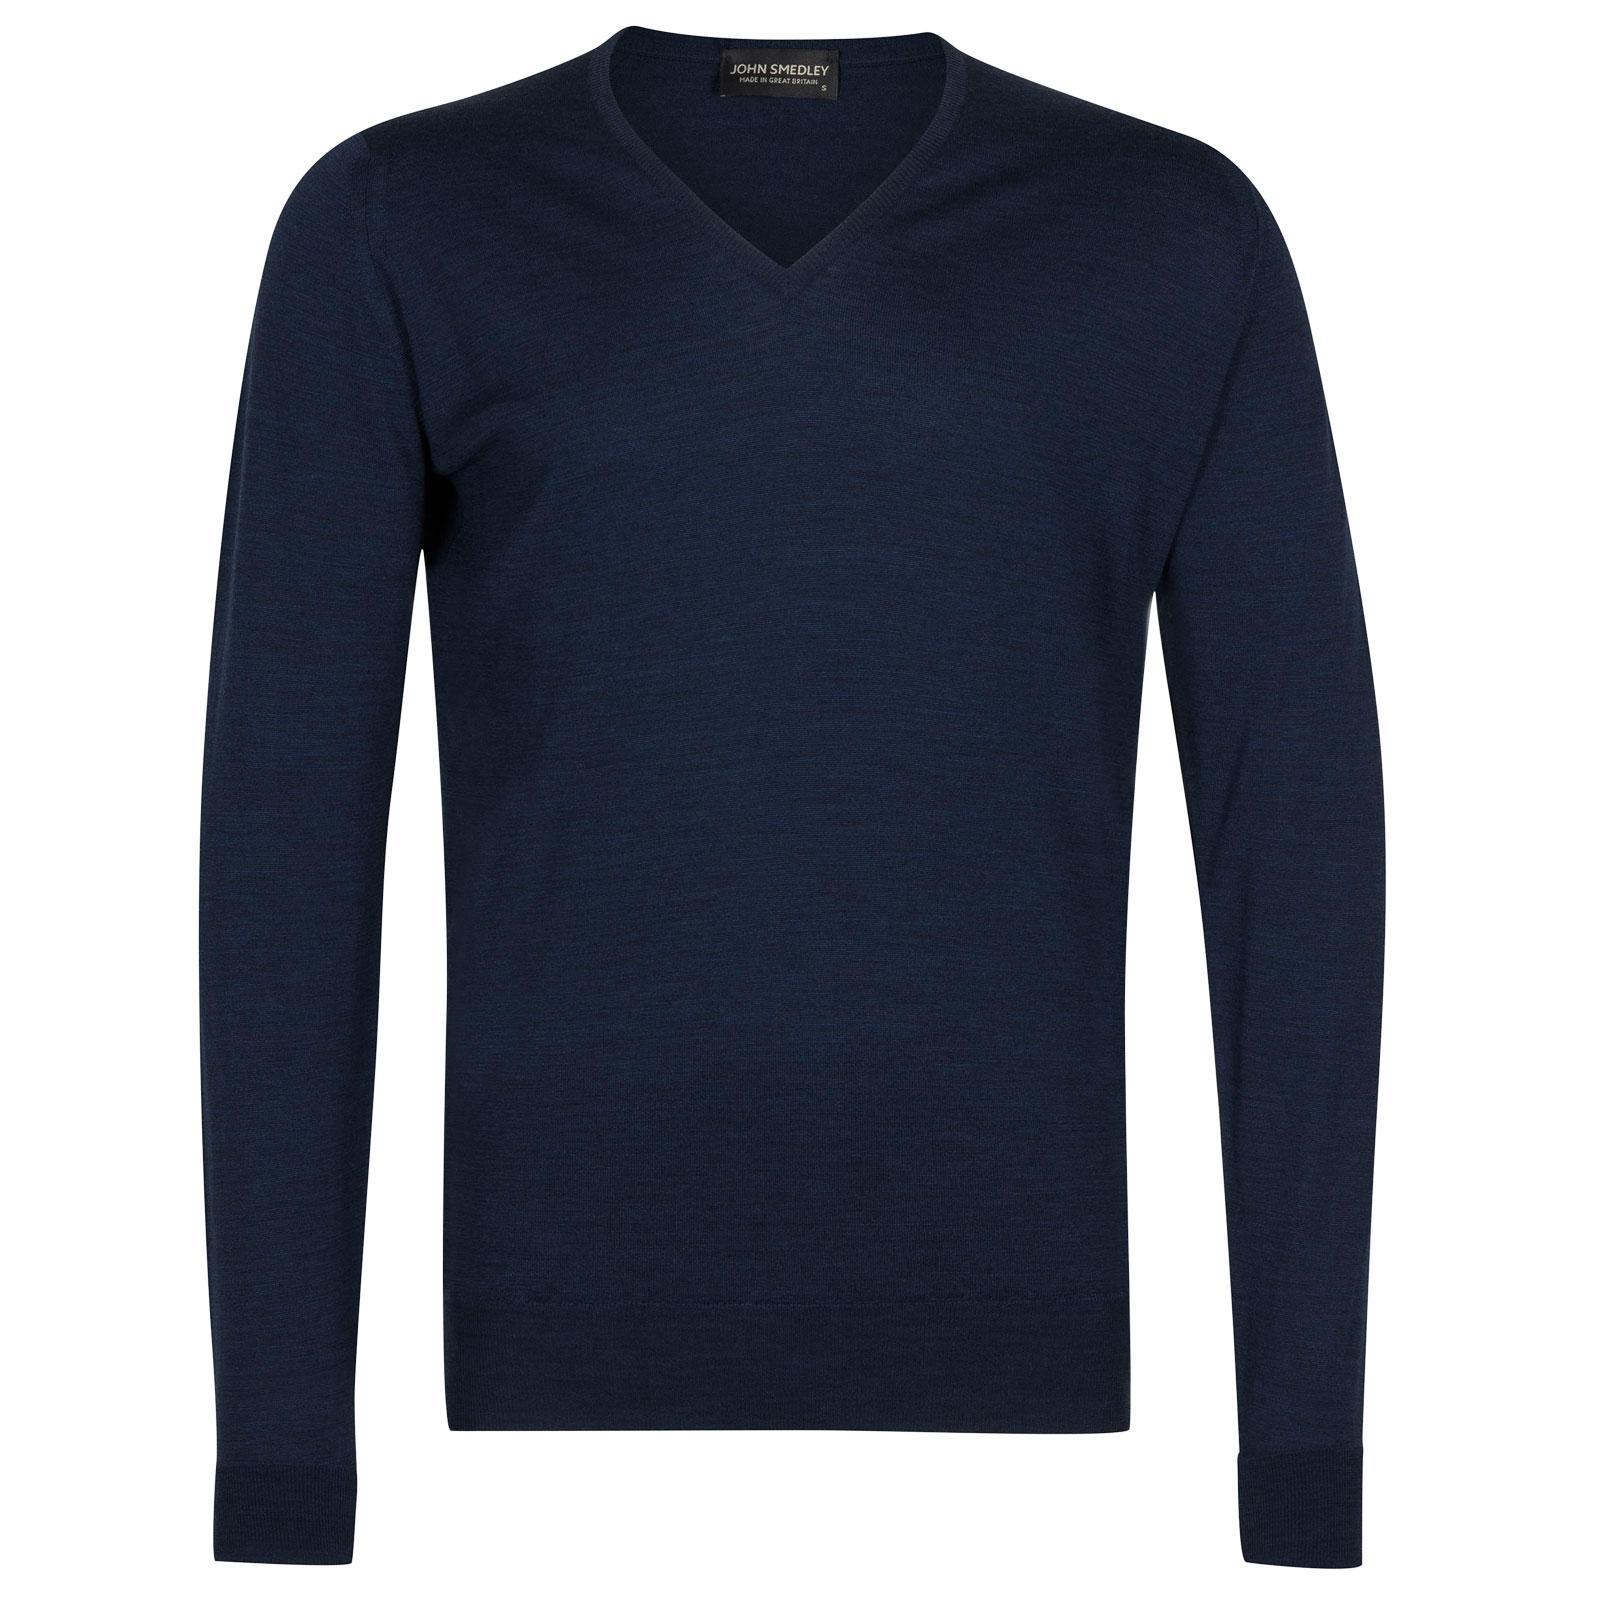 John Smedley Blenheim Merino Wool Pullover in Indigo-XL